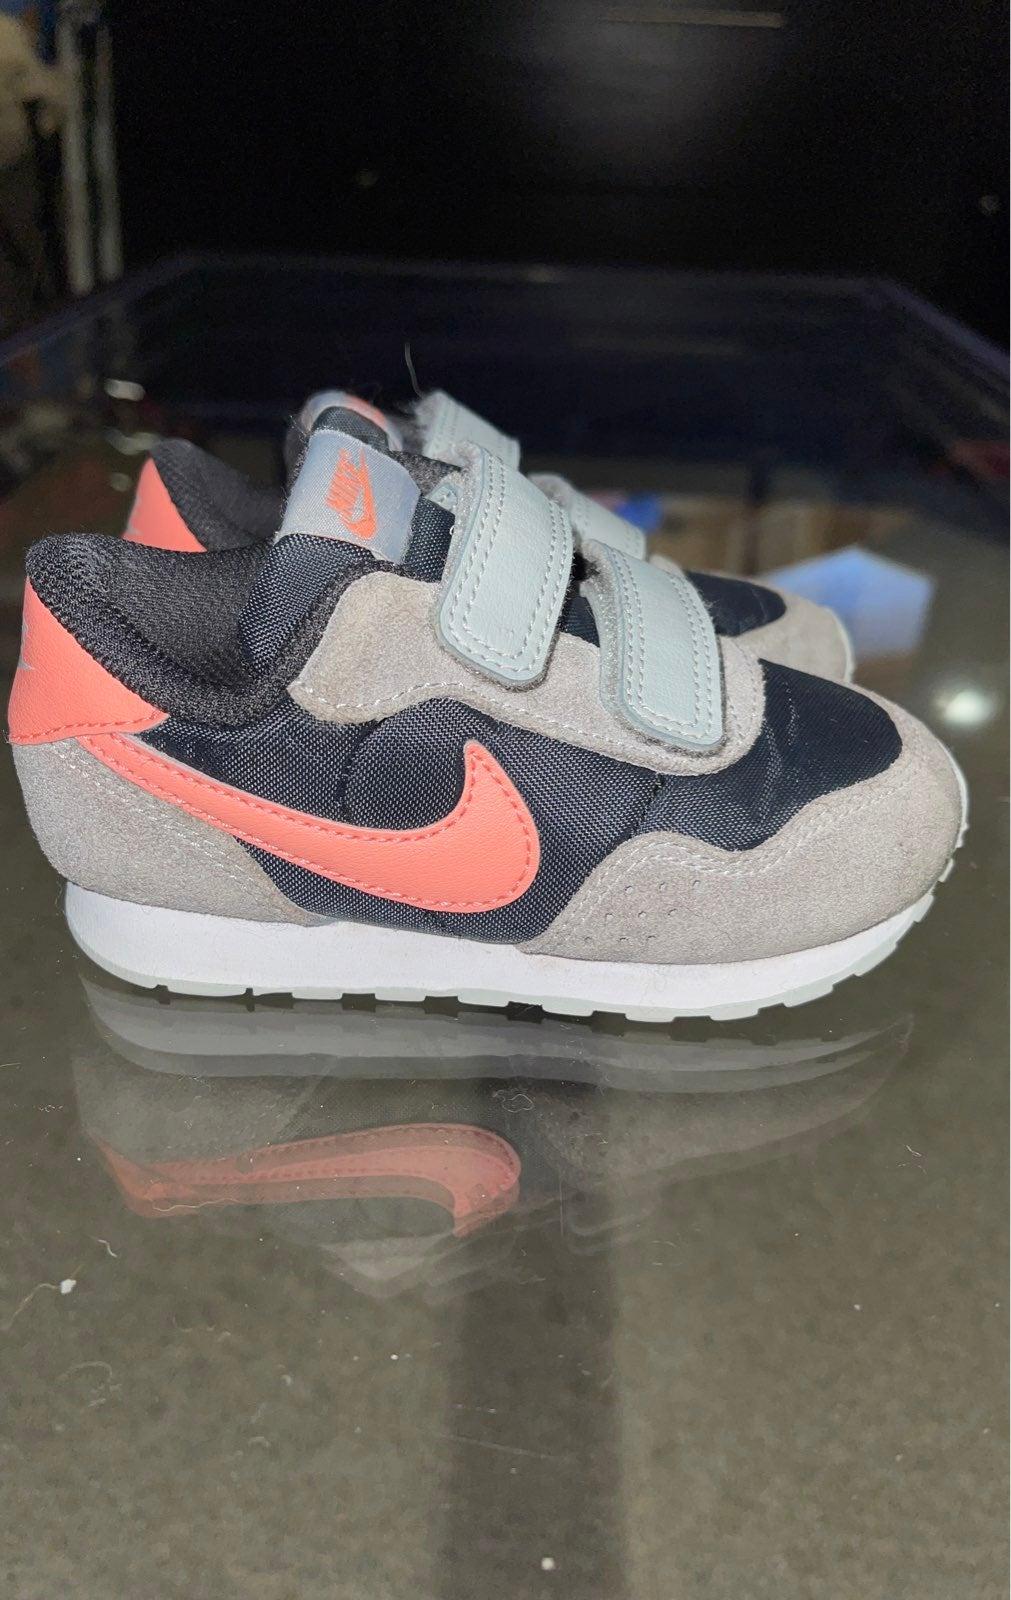 Boys Nike Shoes Size 7C